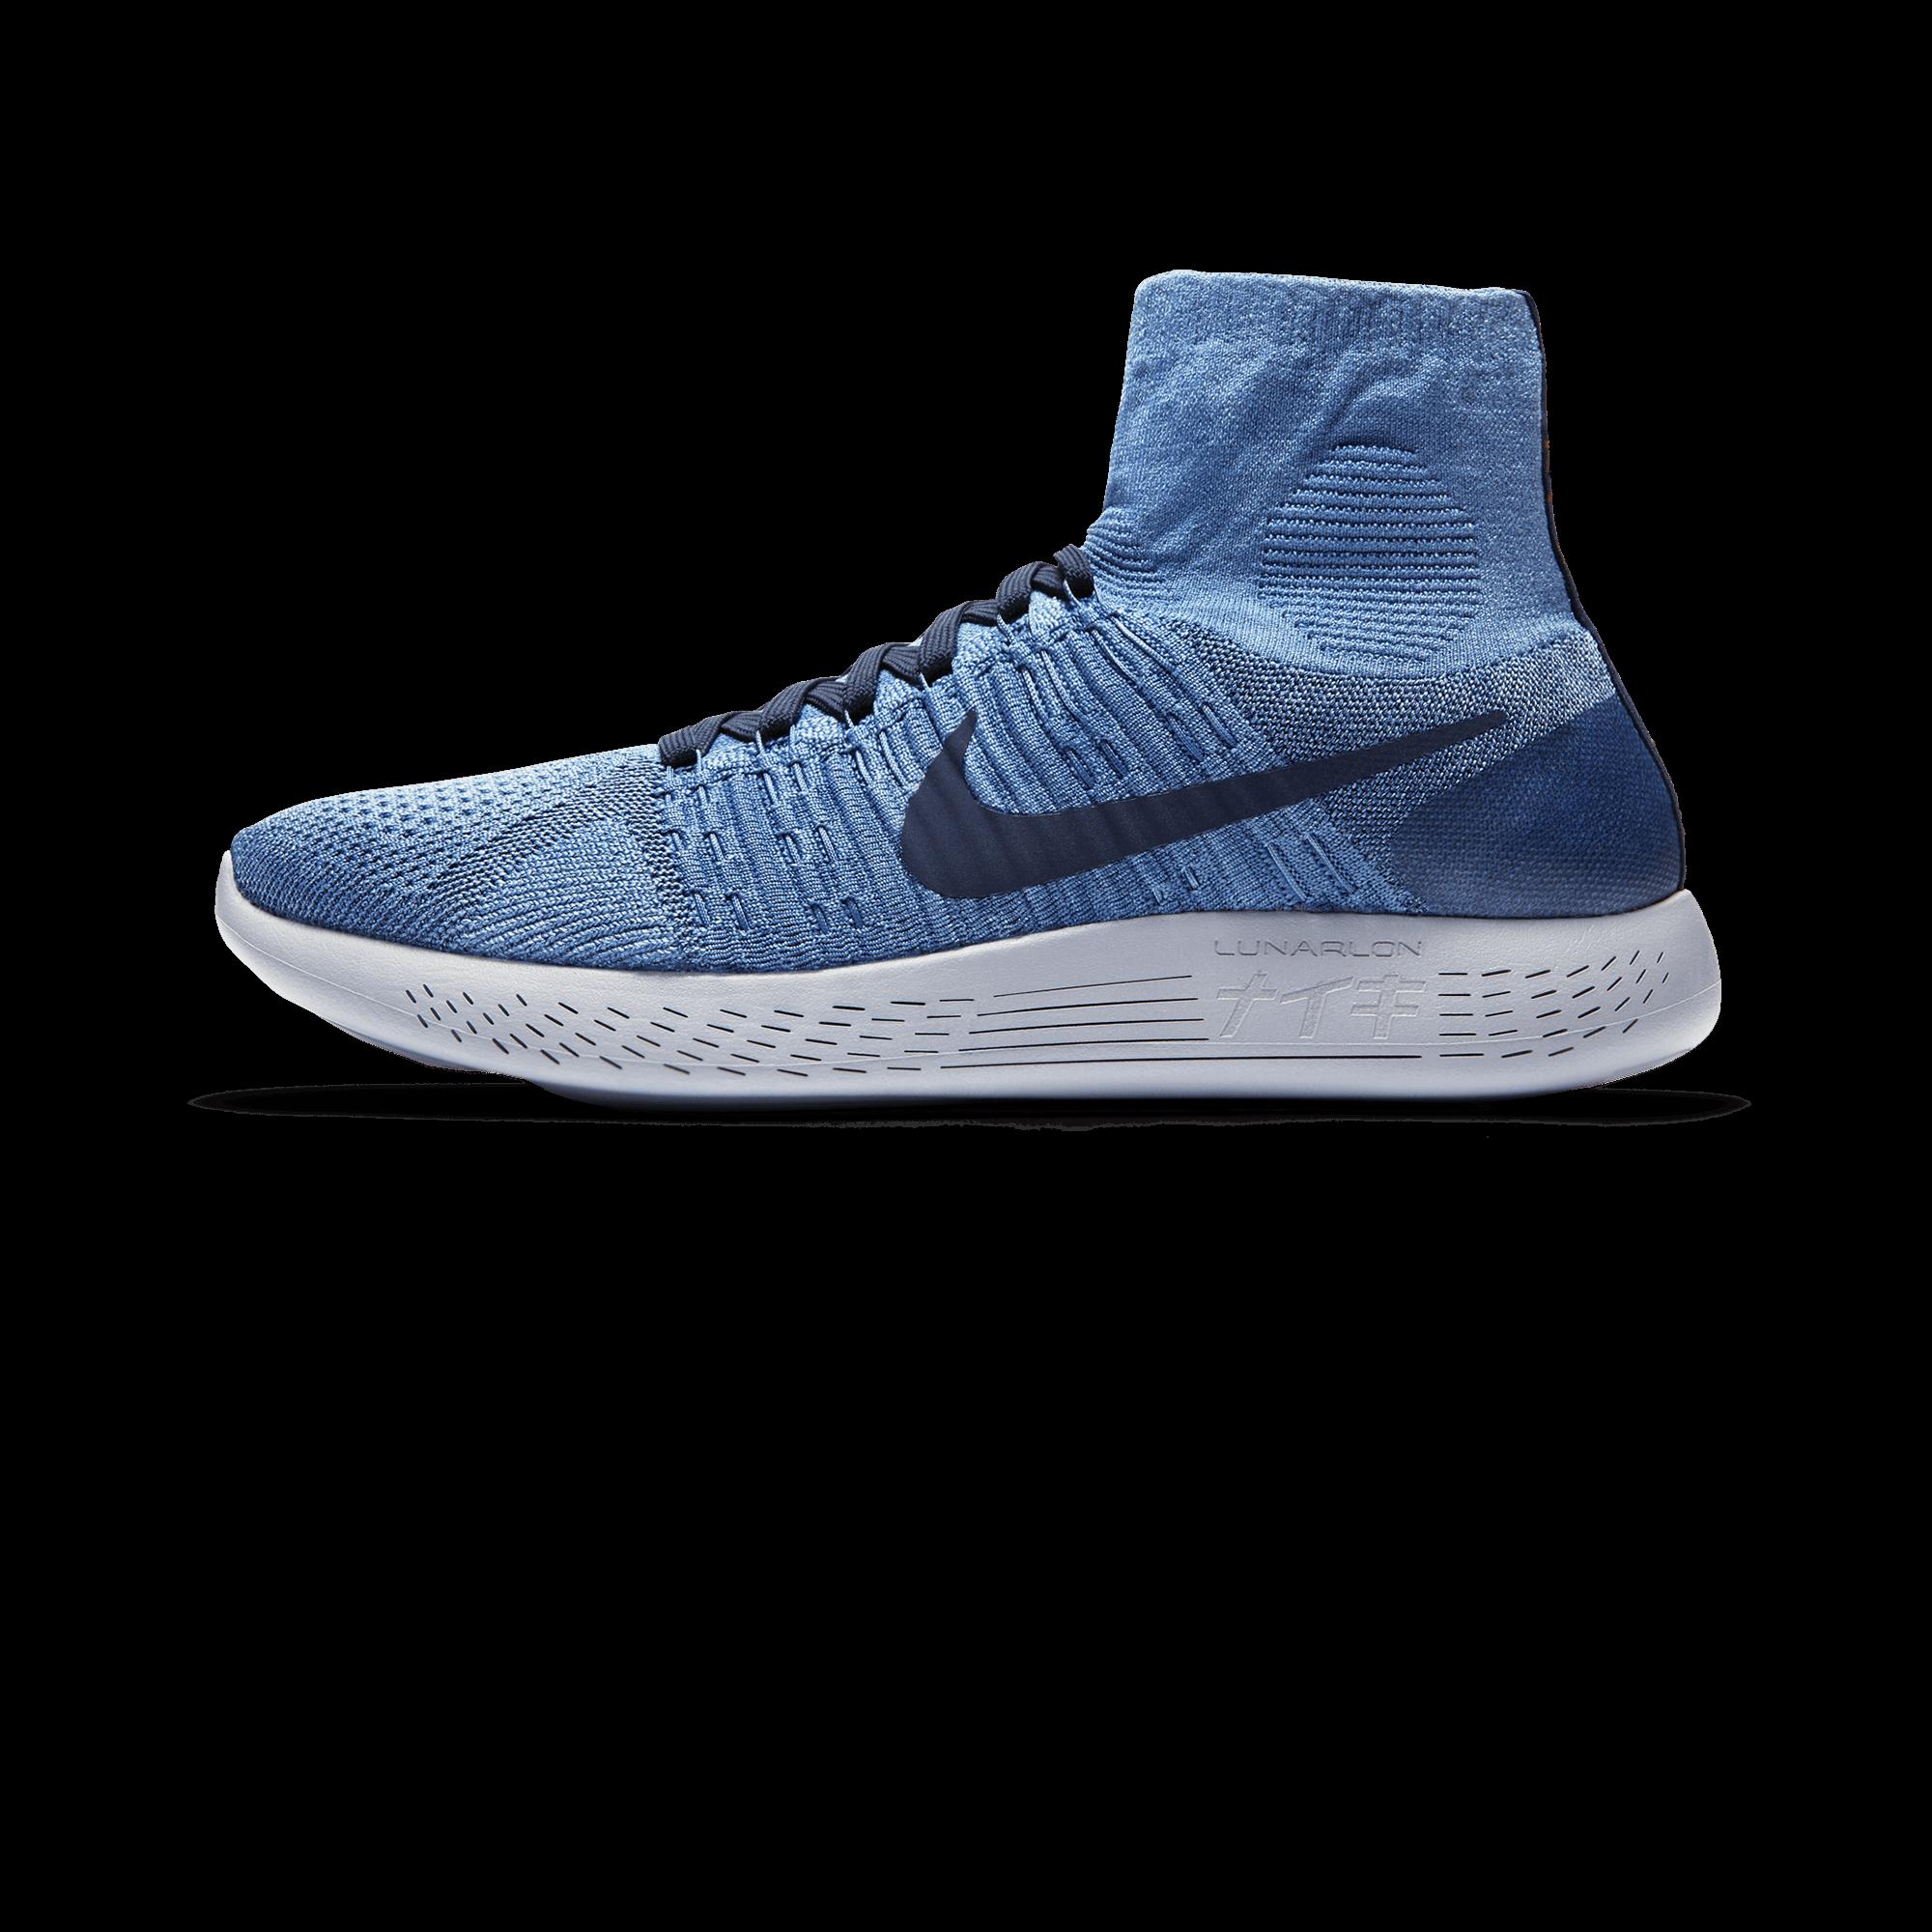 Nike Flyknit Lunarepic Ucraino Maschile yeKPQQm